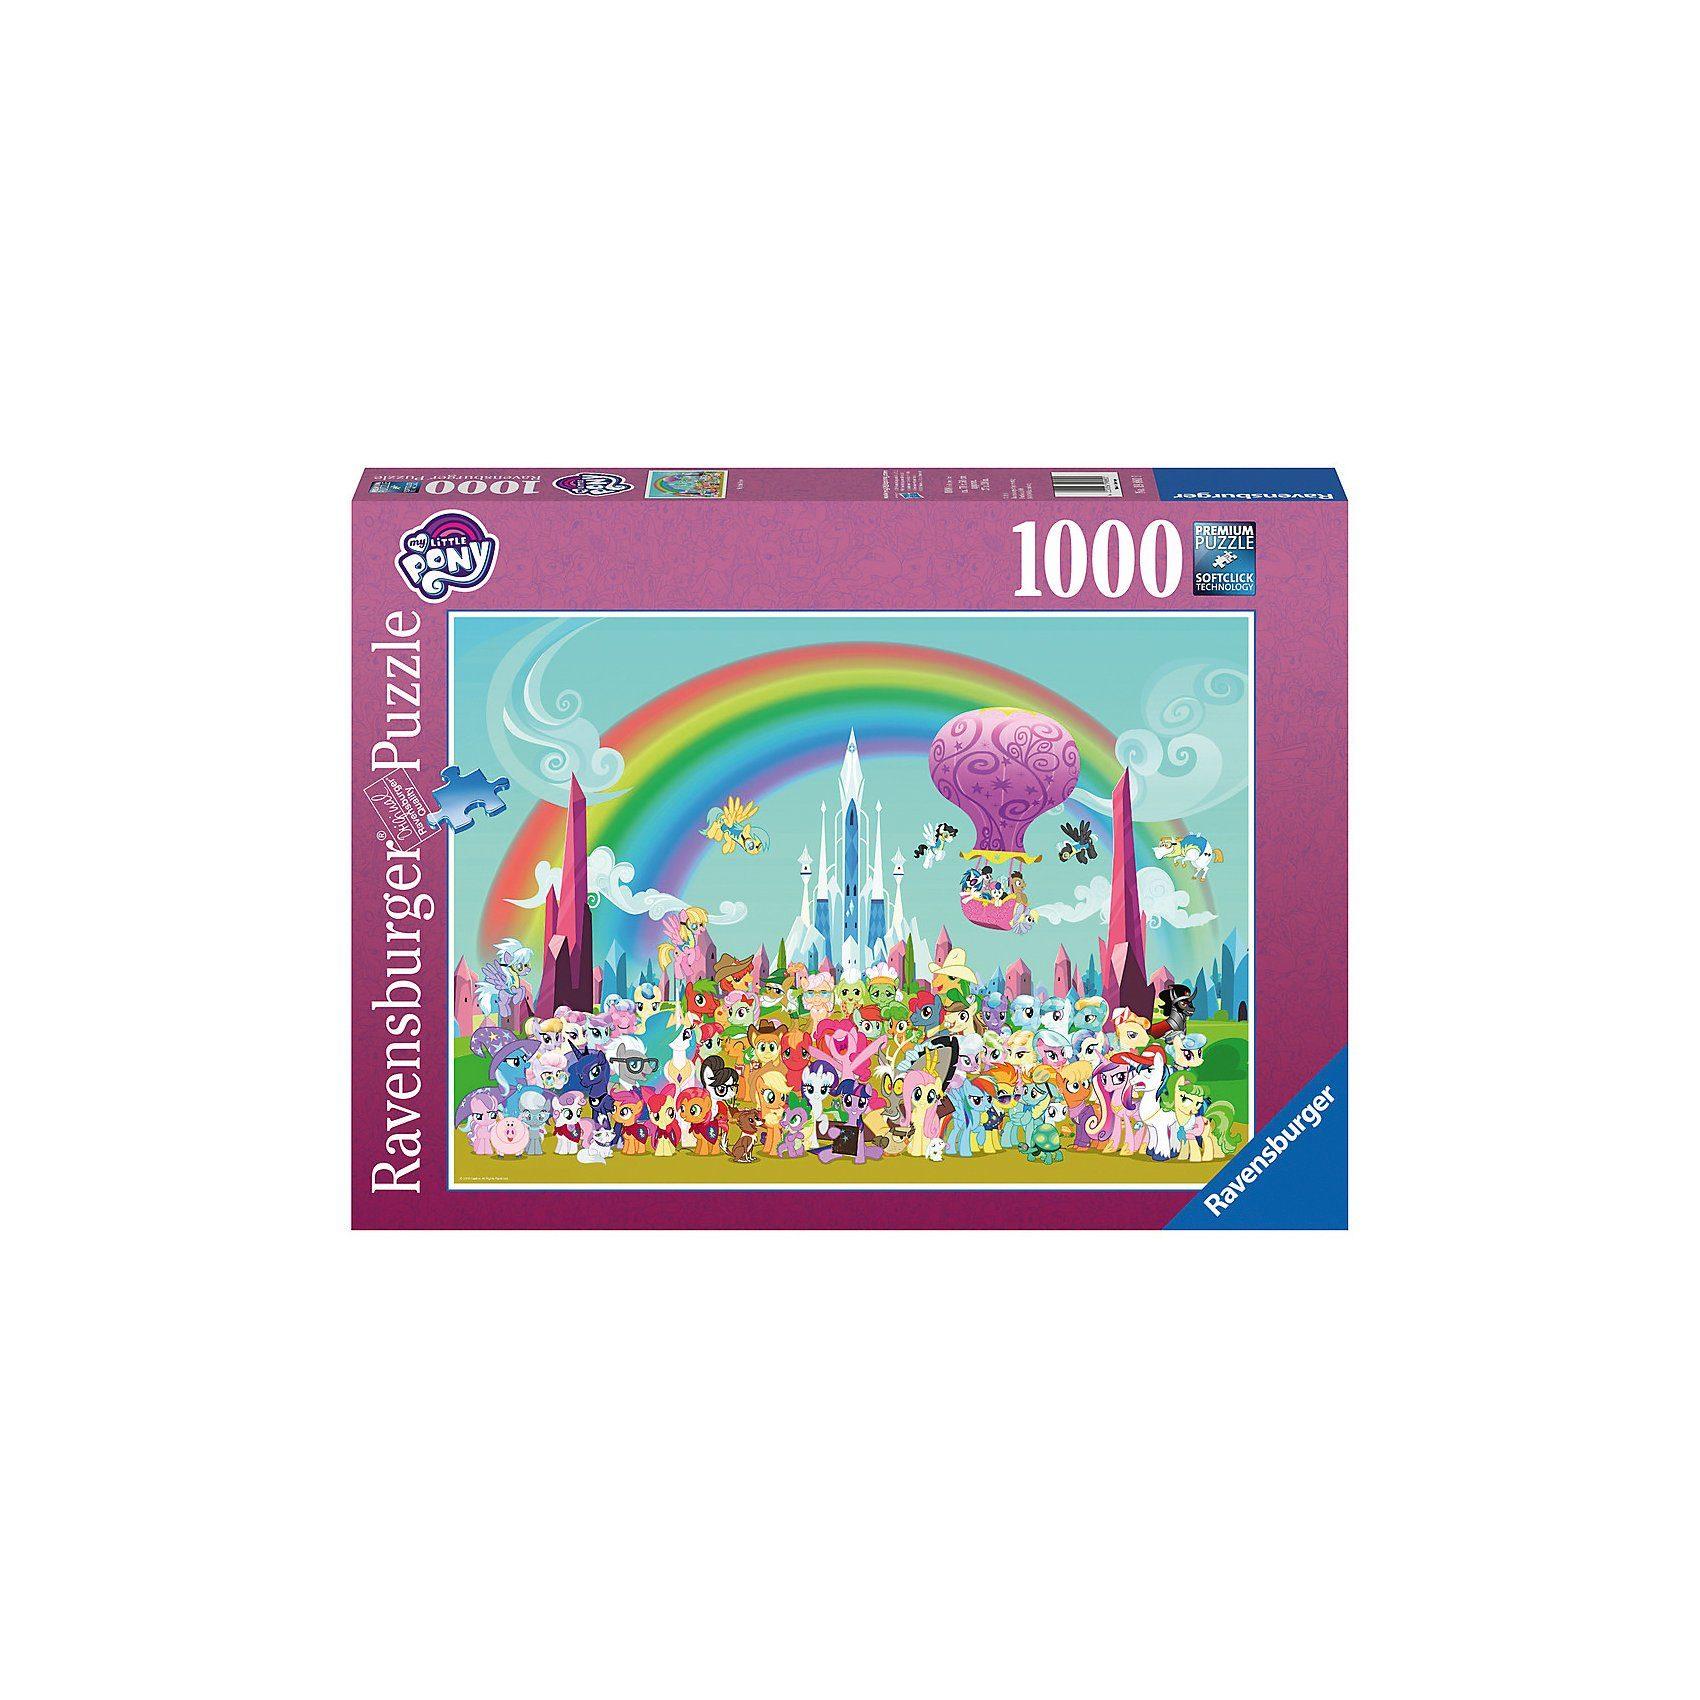 Ravensburger Puzzle 1000 Teile My little Pony unterm Regenbogen